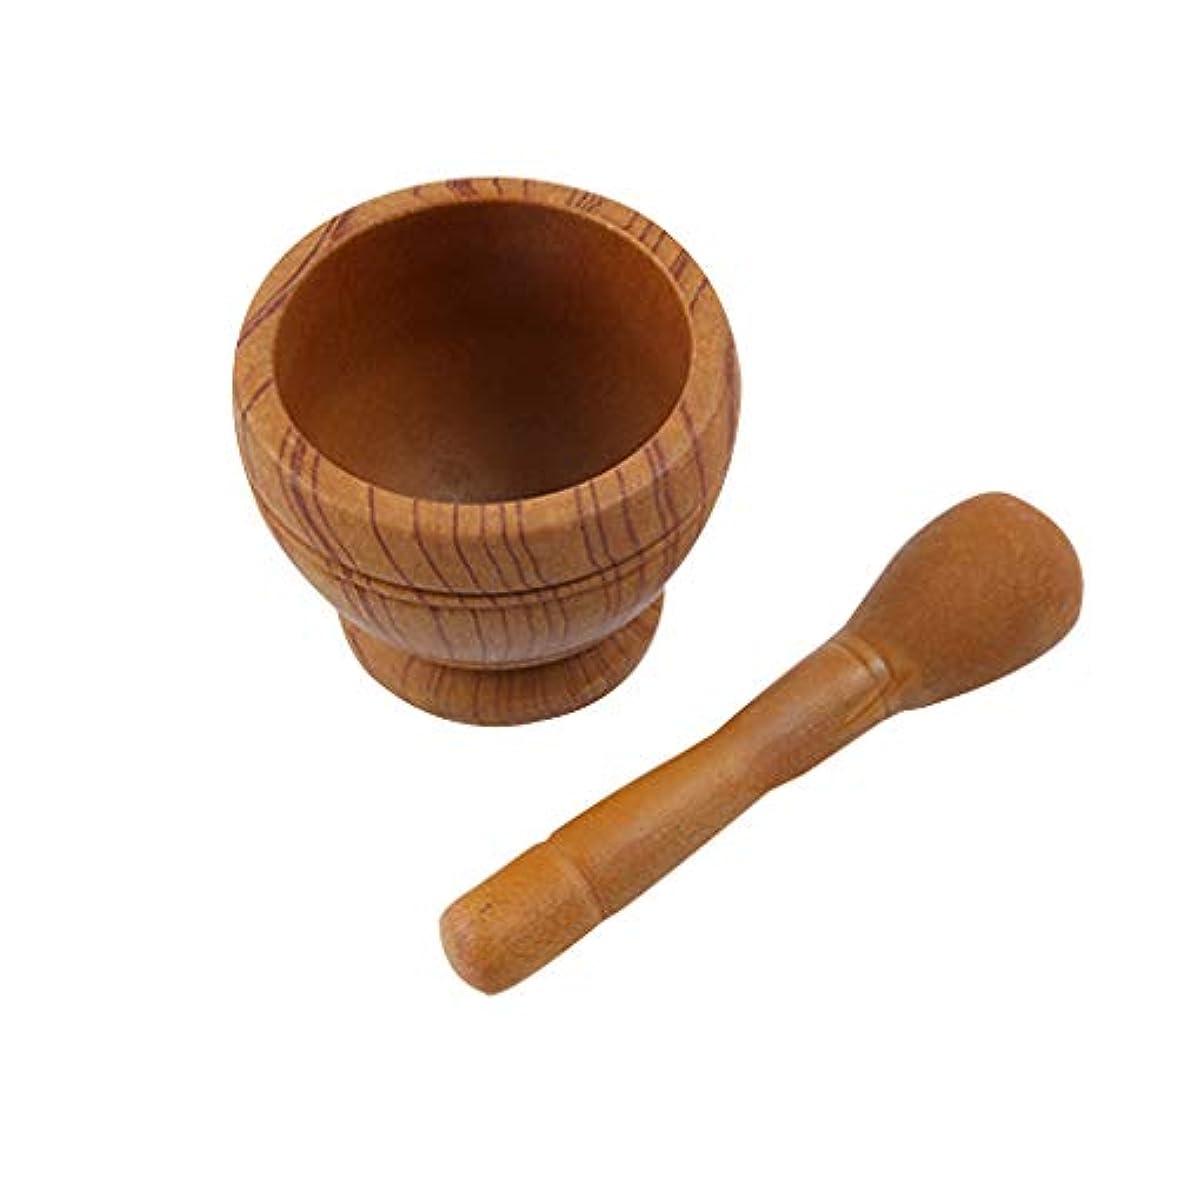 uzinby 乳鉢セット 乳棒付 多用途 食品級樹脂製 料理や薬の調合や理科の実験などに使用 ハーブ/生姜/唐辛子/にんにく/薬など適用